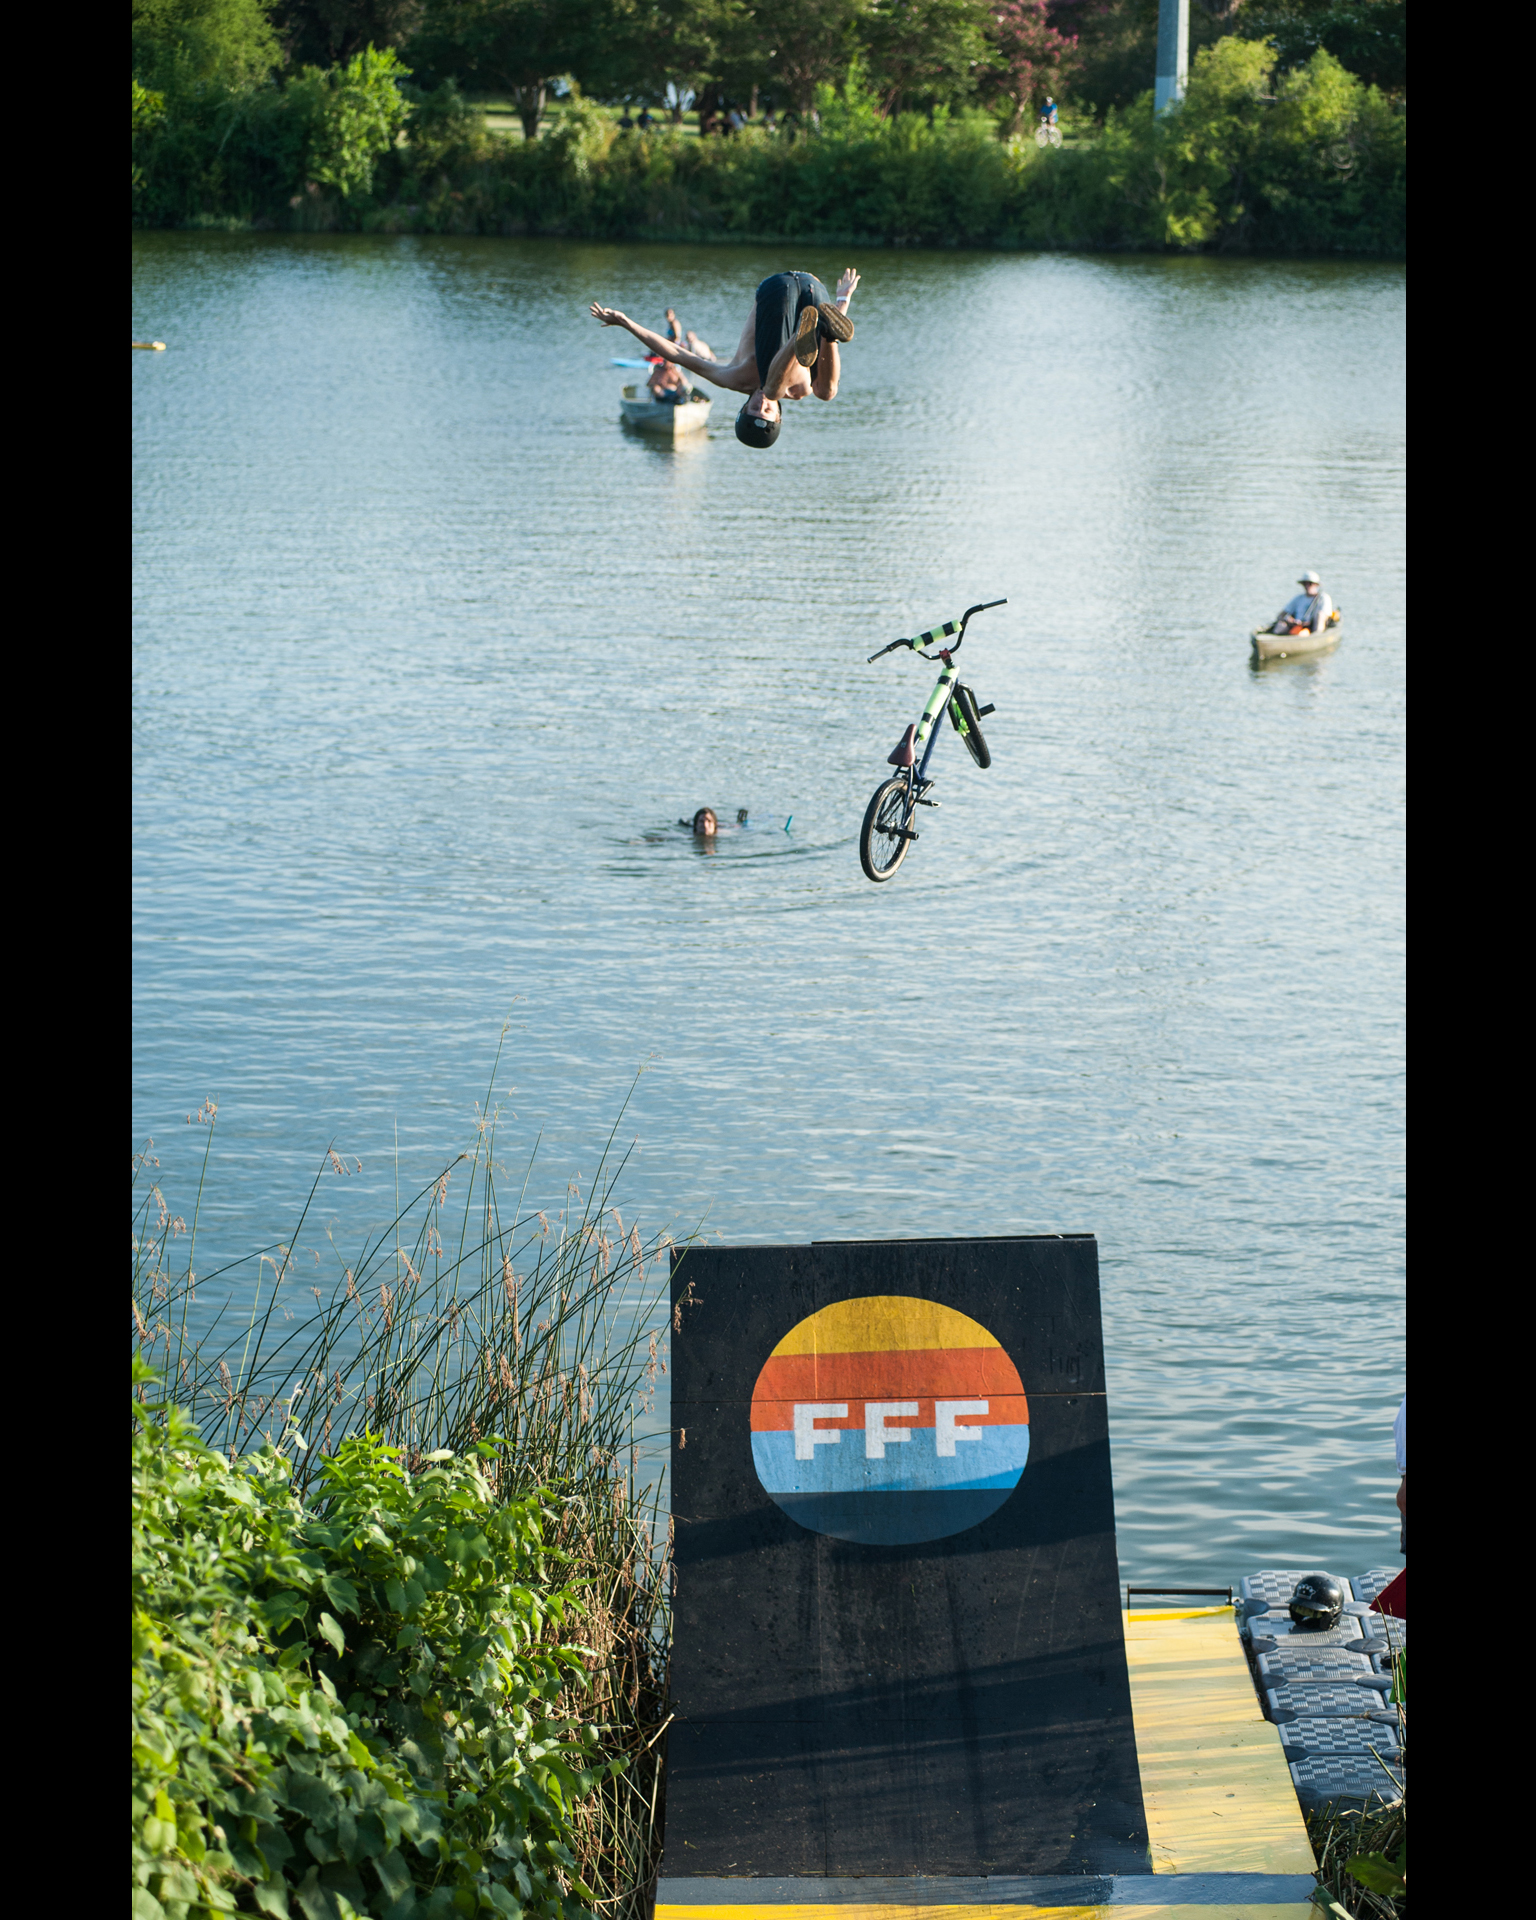 Flip dismount